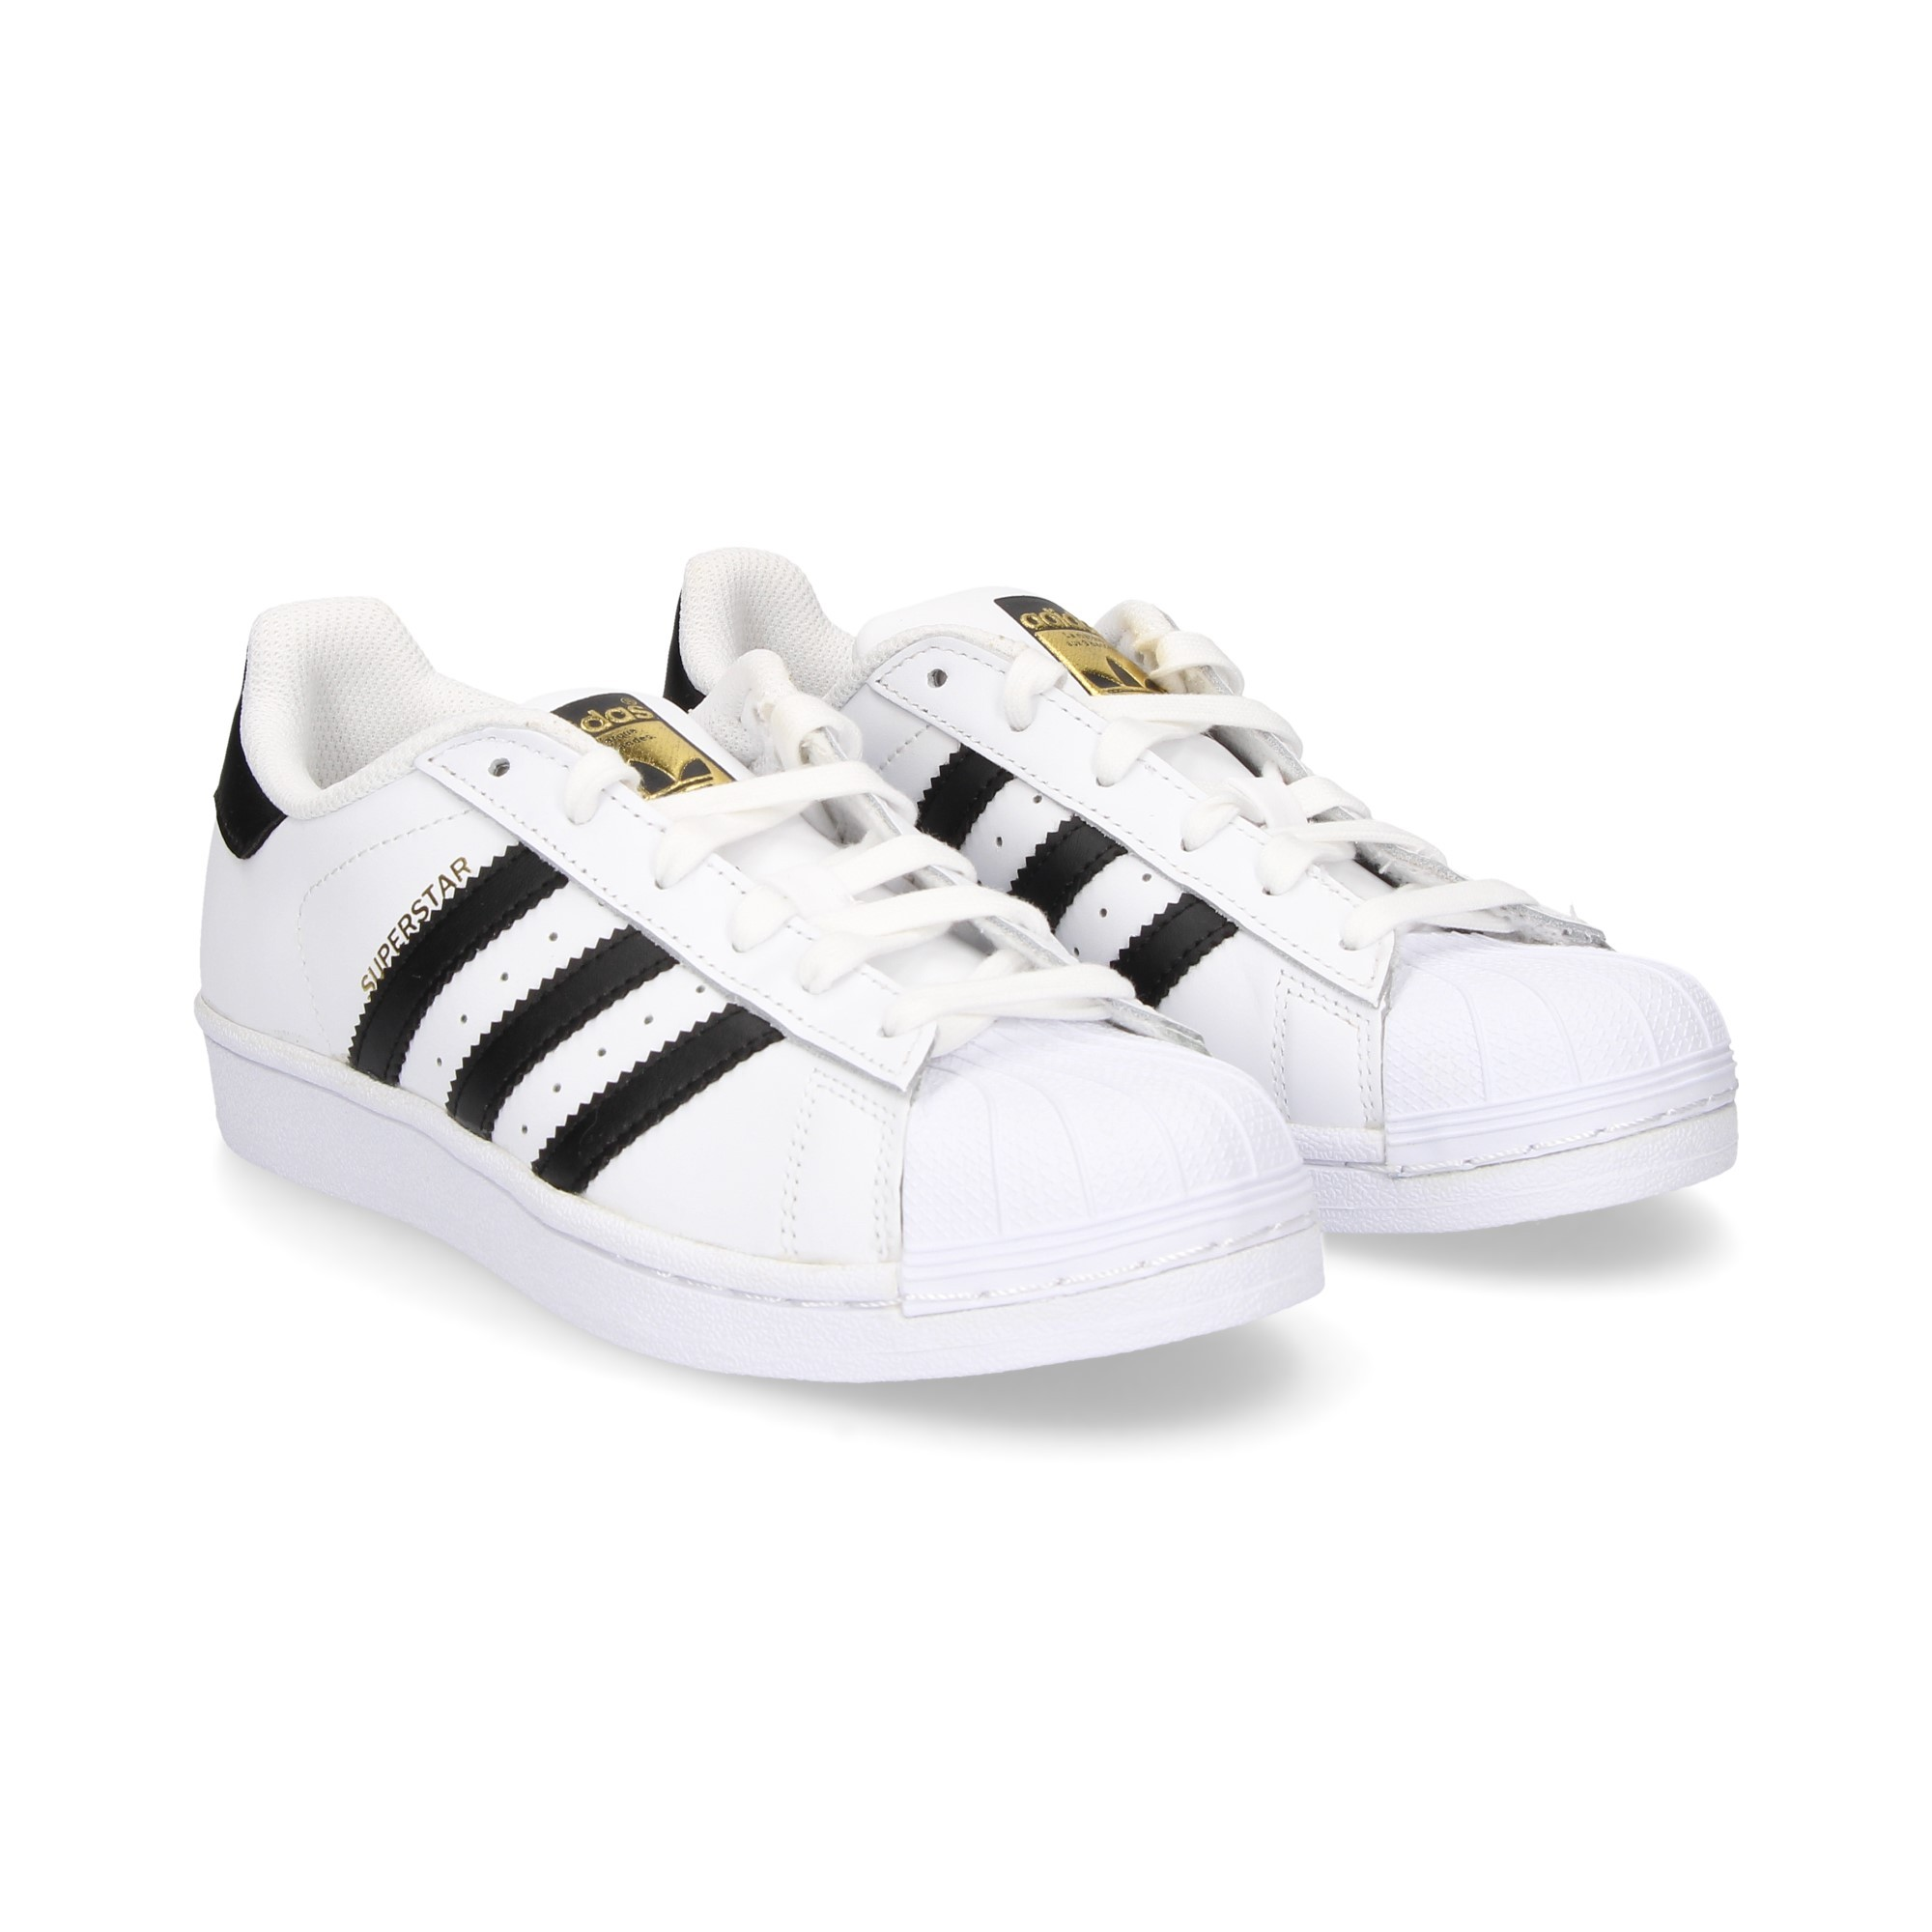 deportivo-cordones-blanco-negro